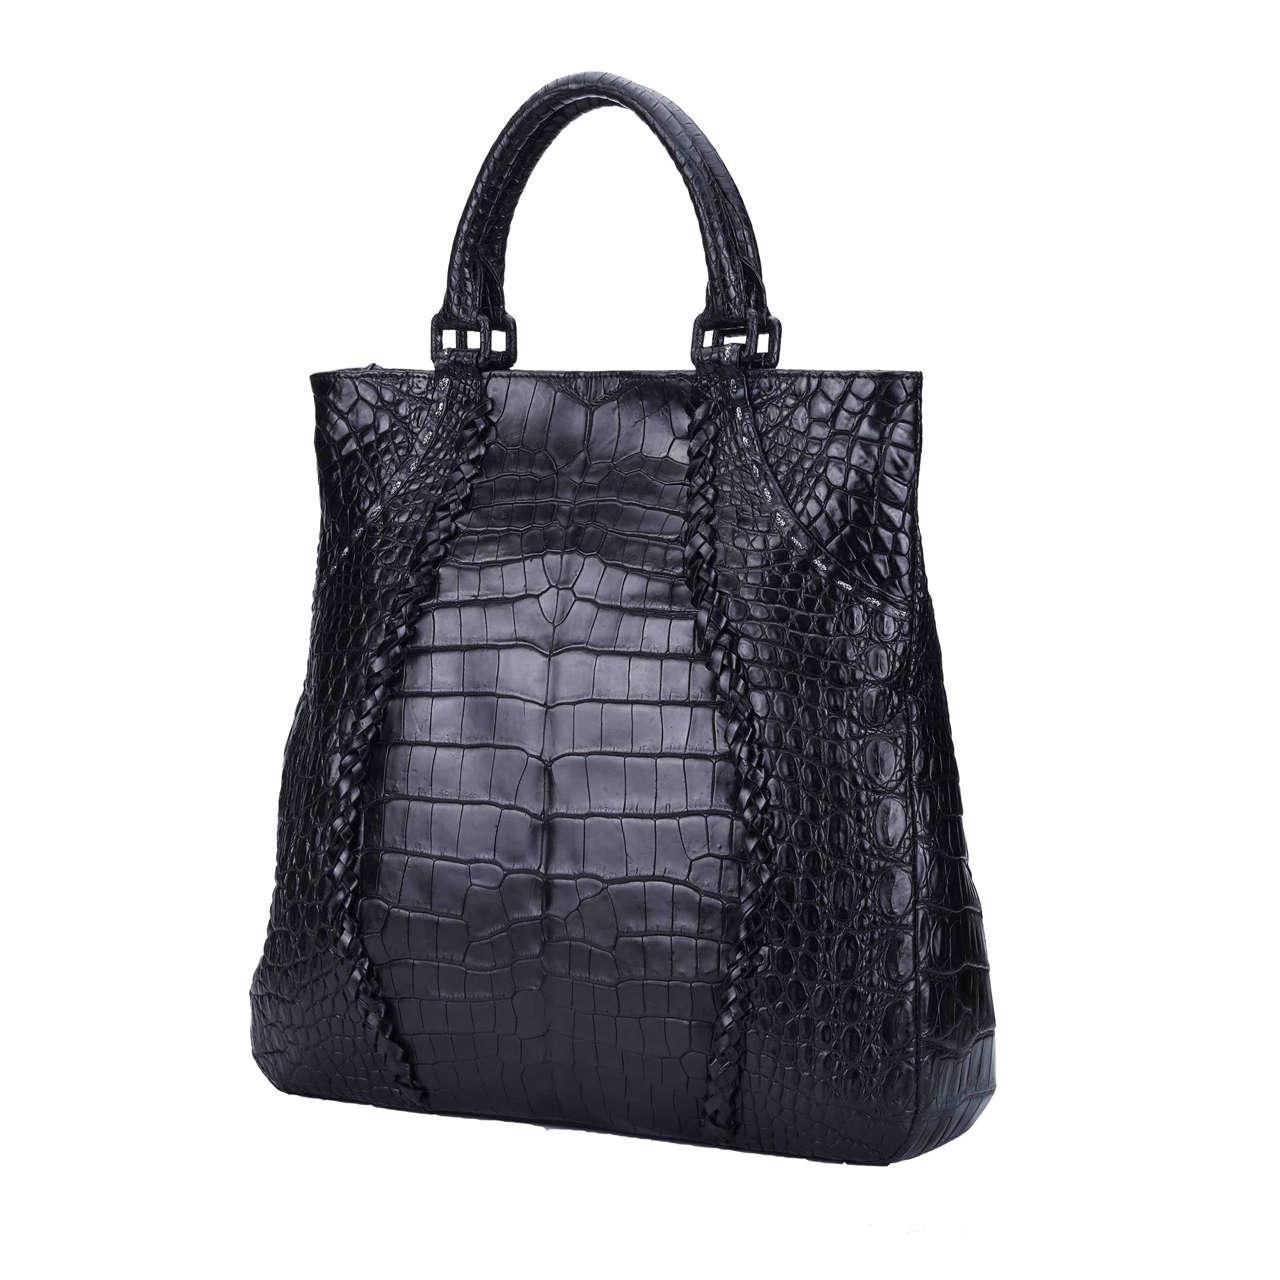 GF bags-Custom Latest Handbags Manufacturer, Cheap Handbags Online | Handbag-3